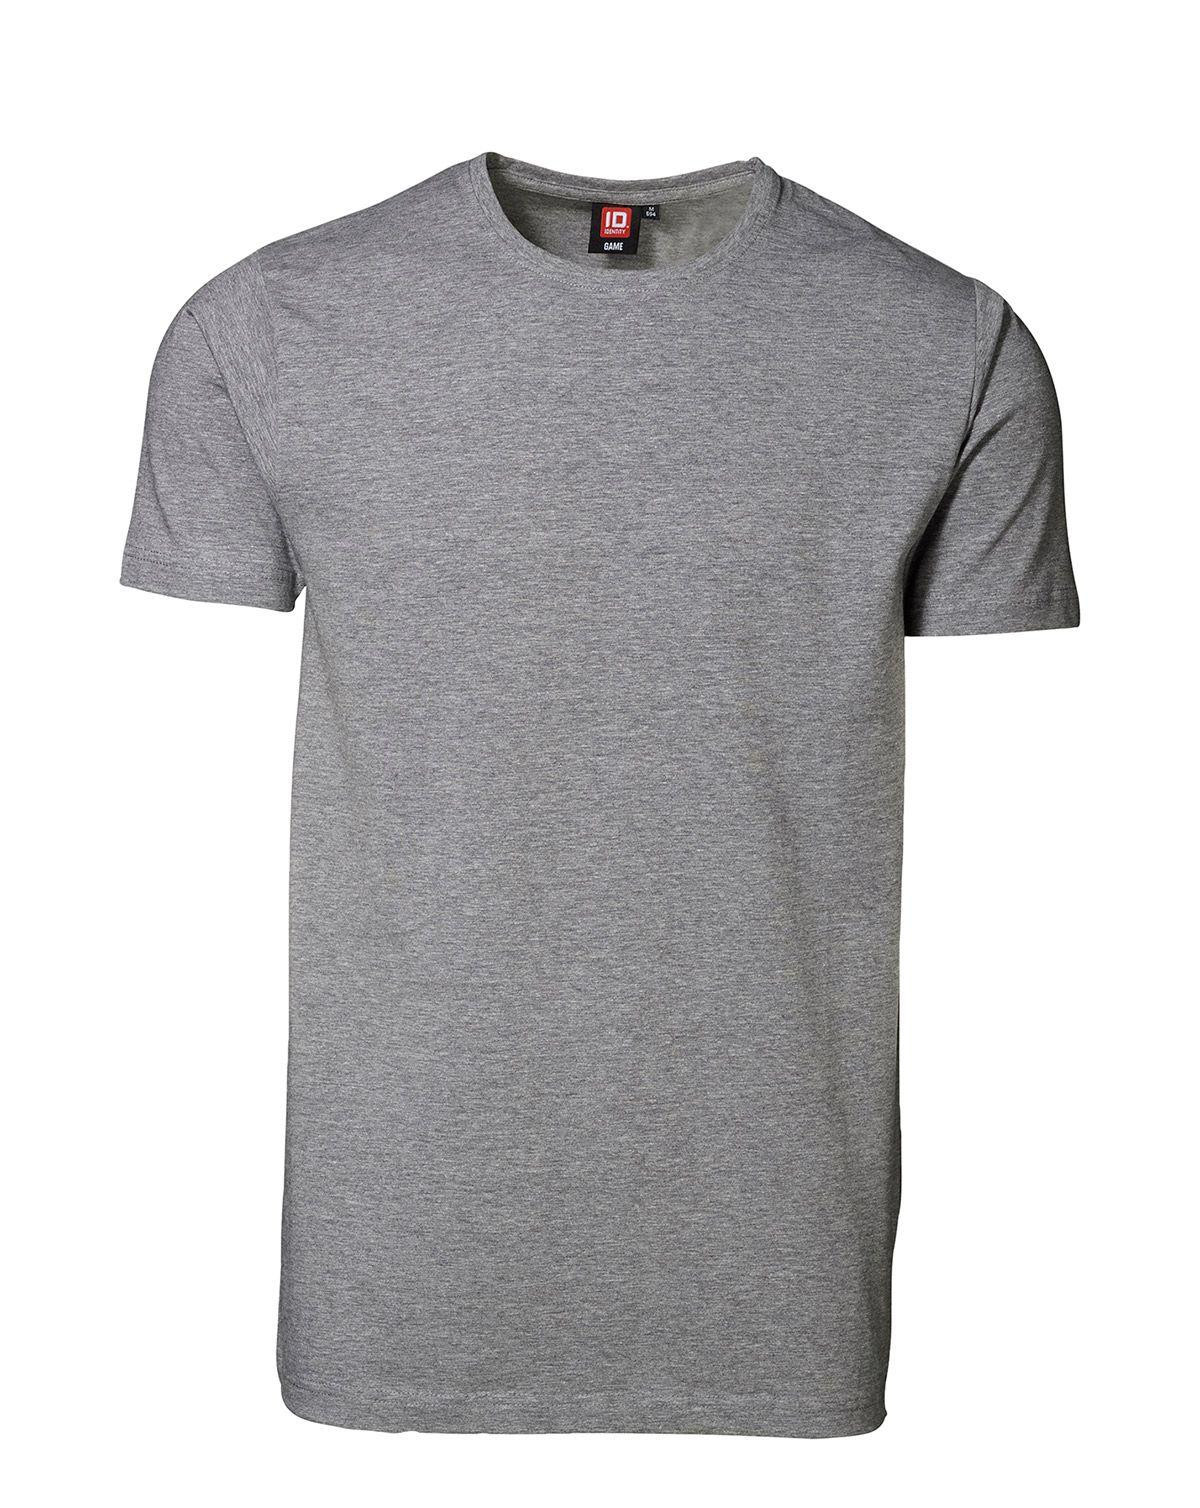 ID Stretch T-shirt (Grå Meleret, XL)